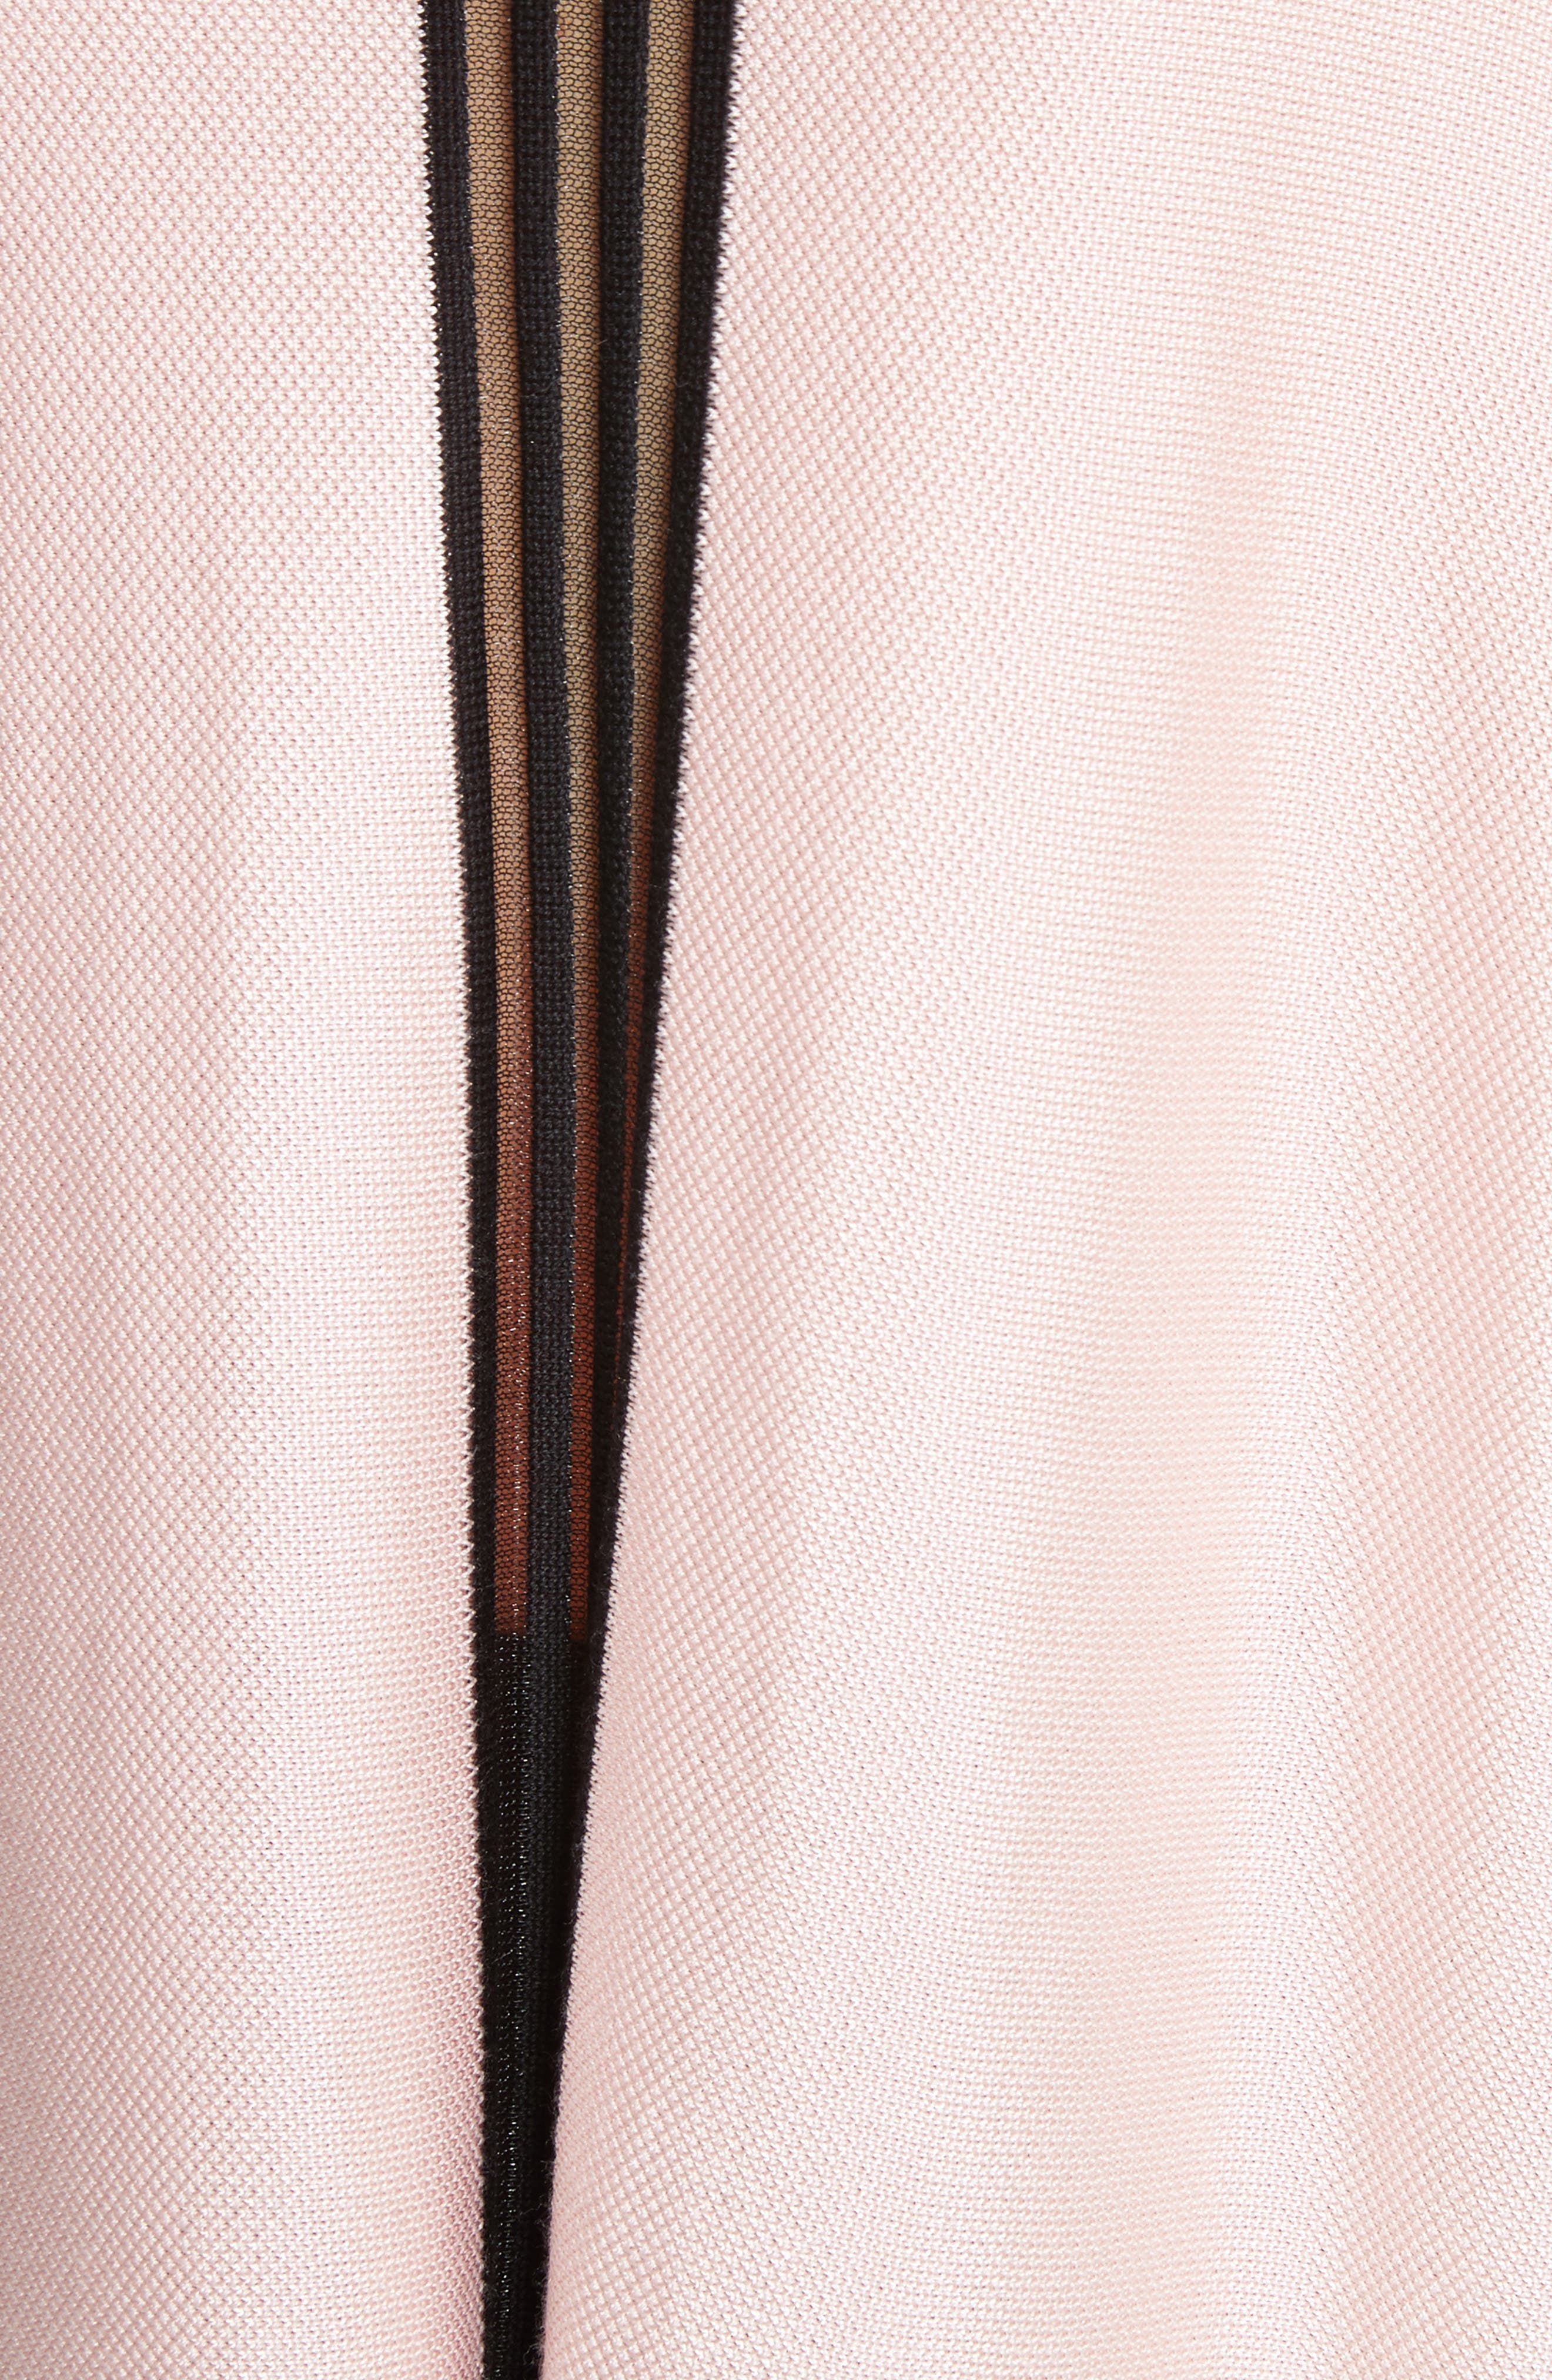 Birdseye Knit Funnel Neck Sweater,                             Alternate thumbnail 5, color,                             680